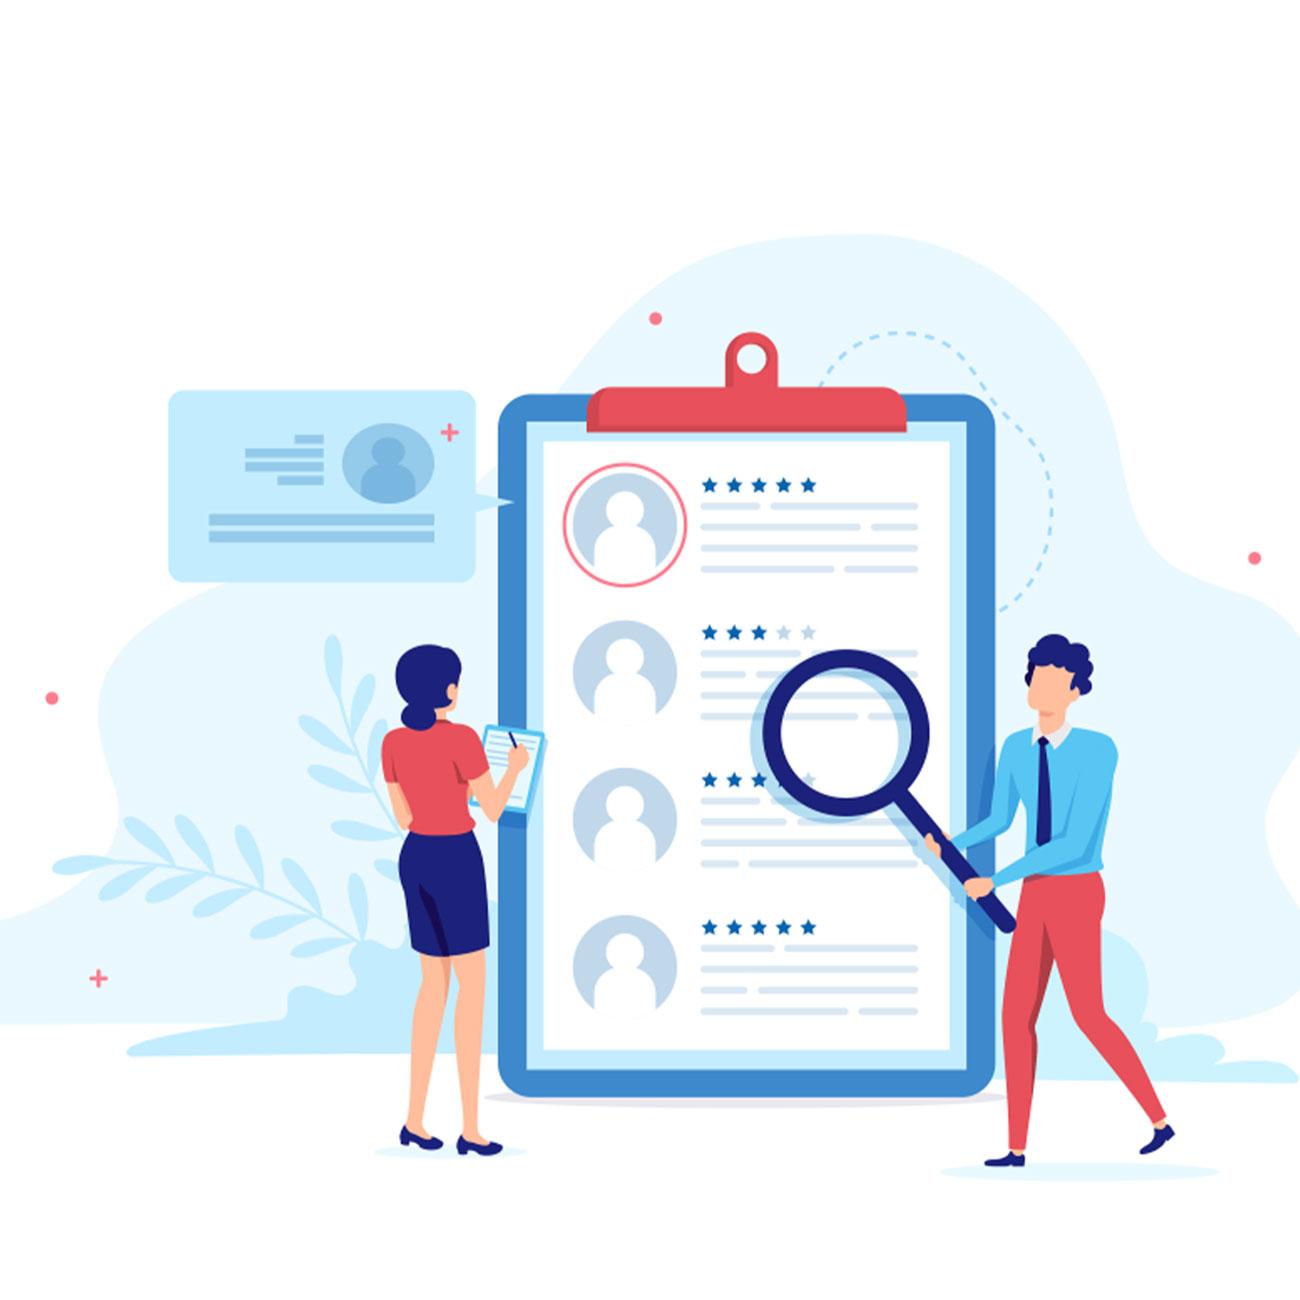 ساخت پروفایل کاربری